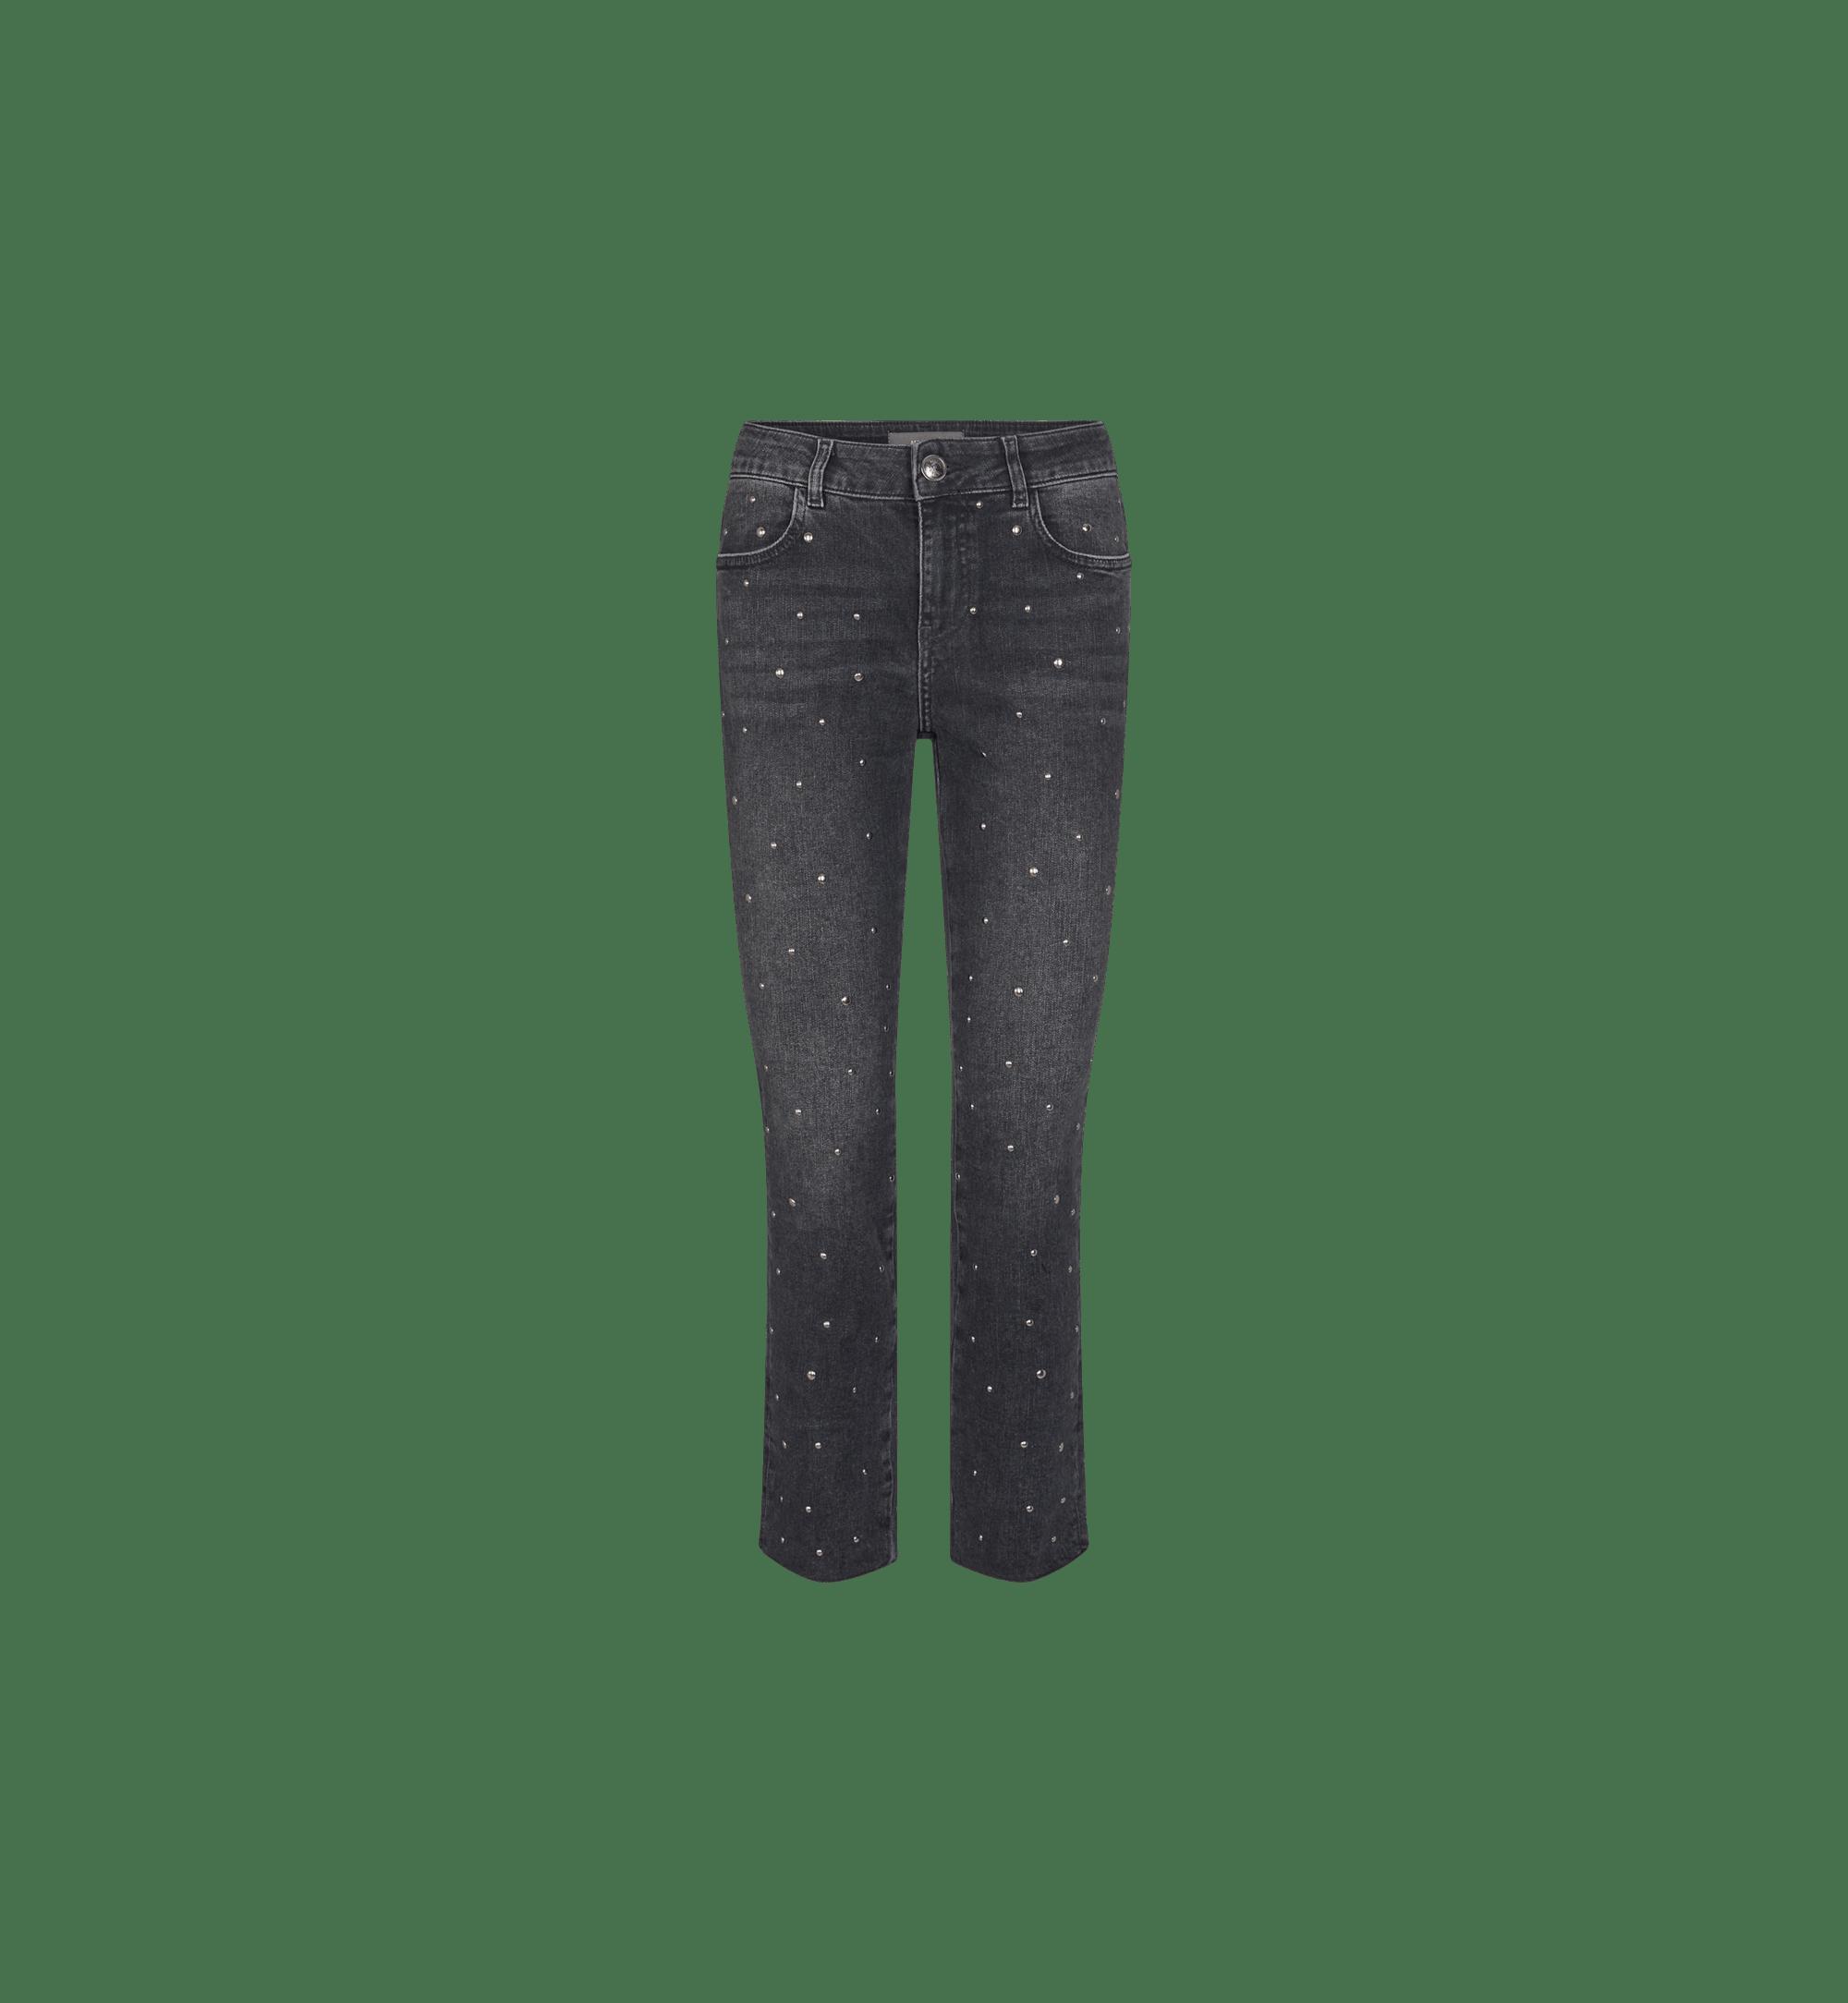 Serena Trok Jeans